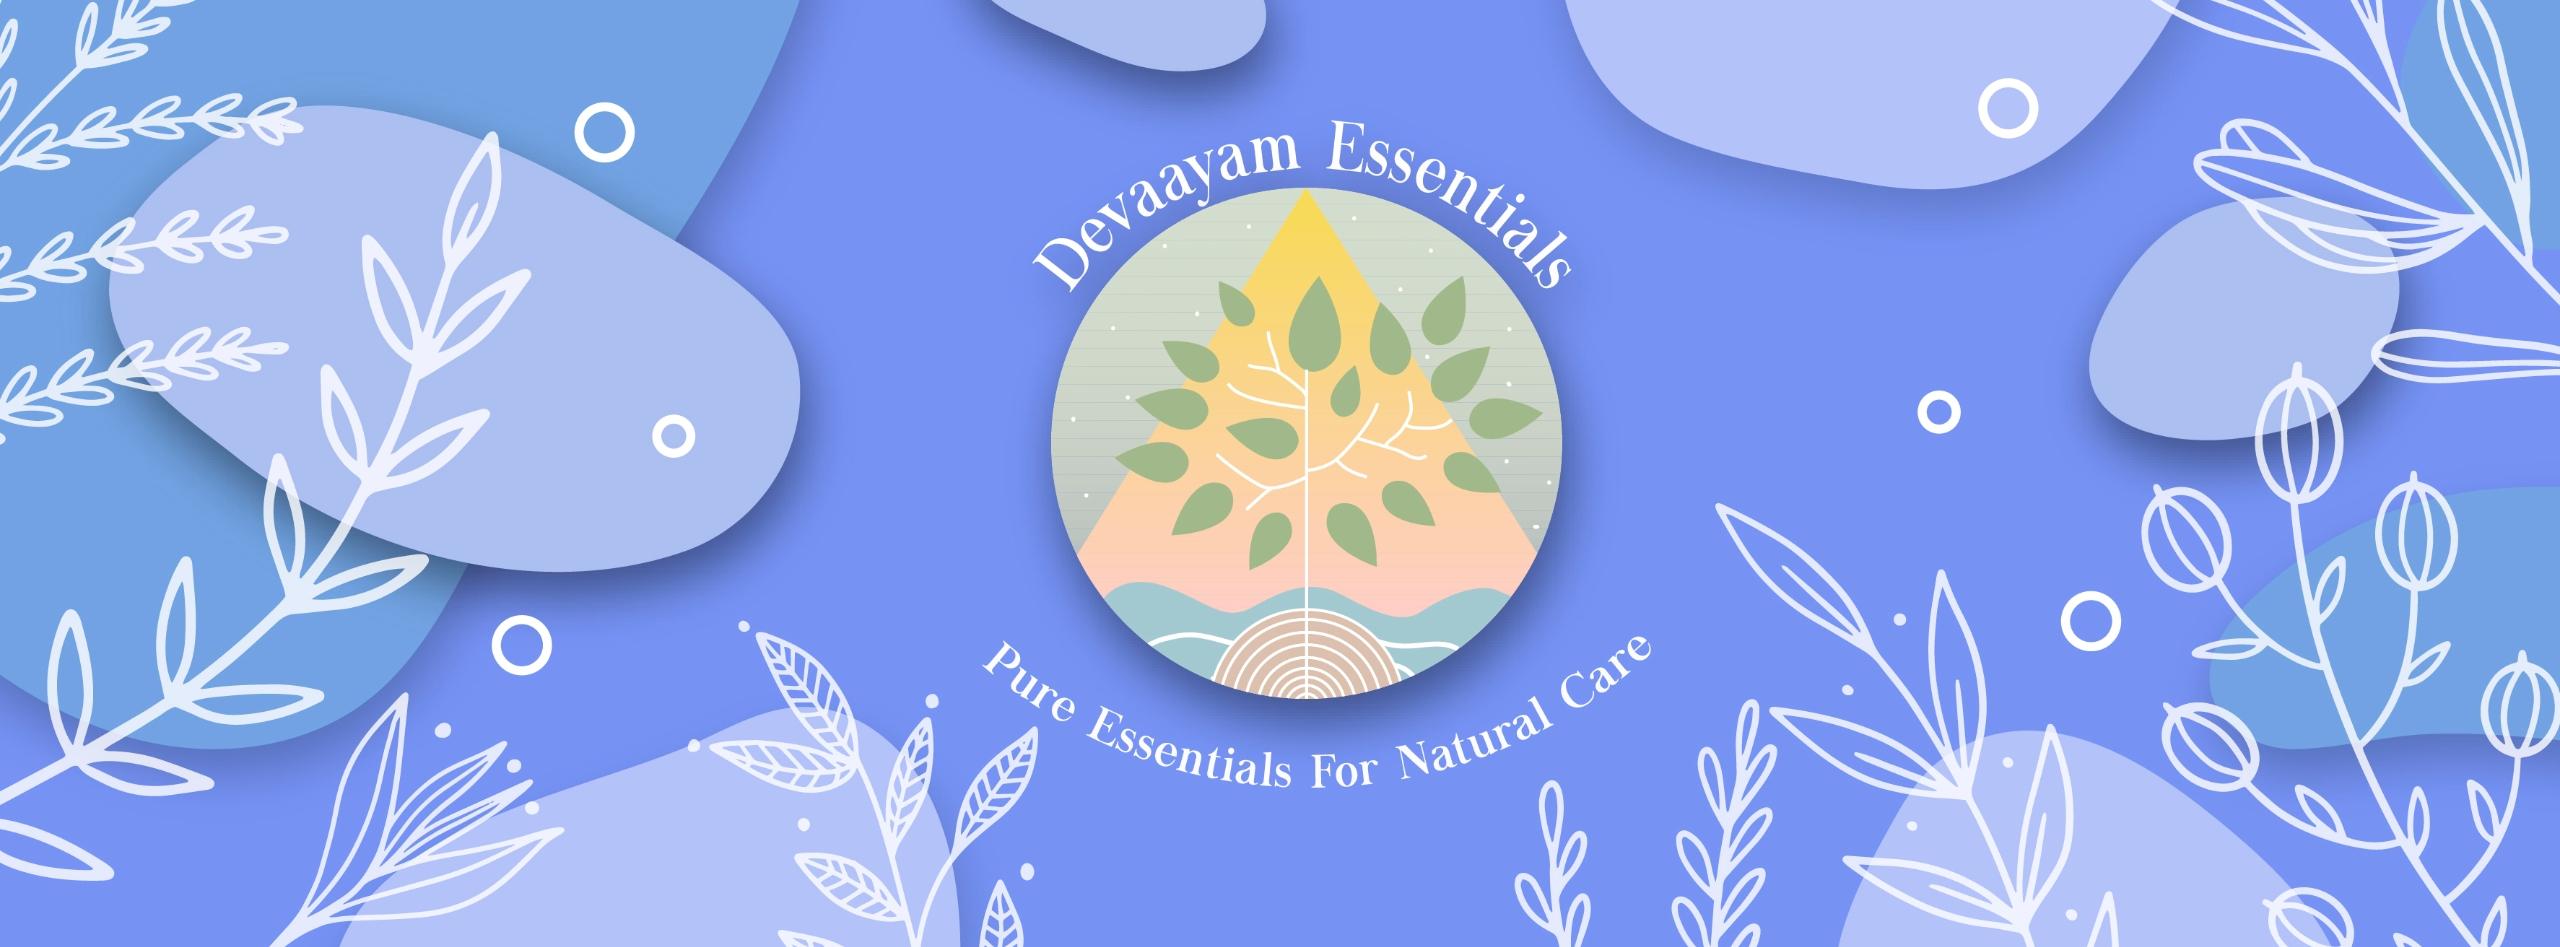 Devaayam Esee (@devaayamessentials) Cover Image